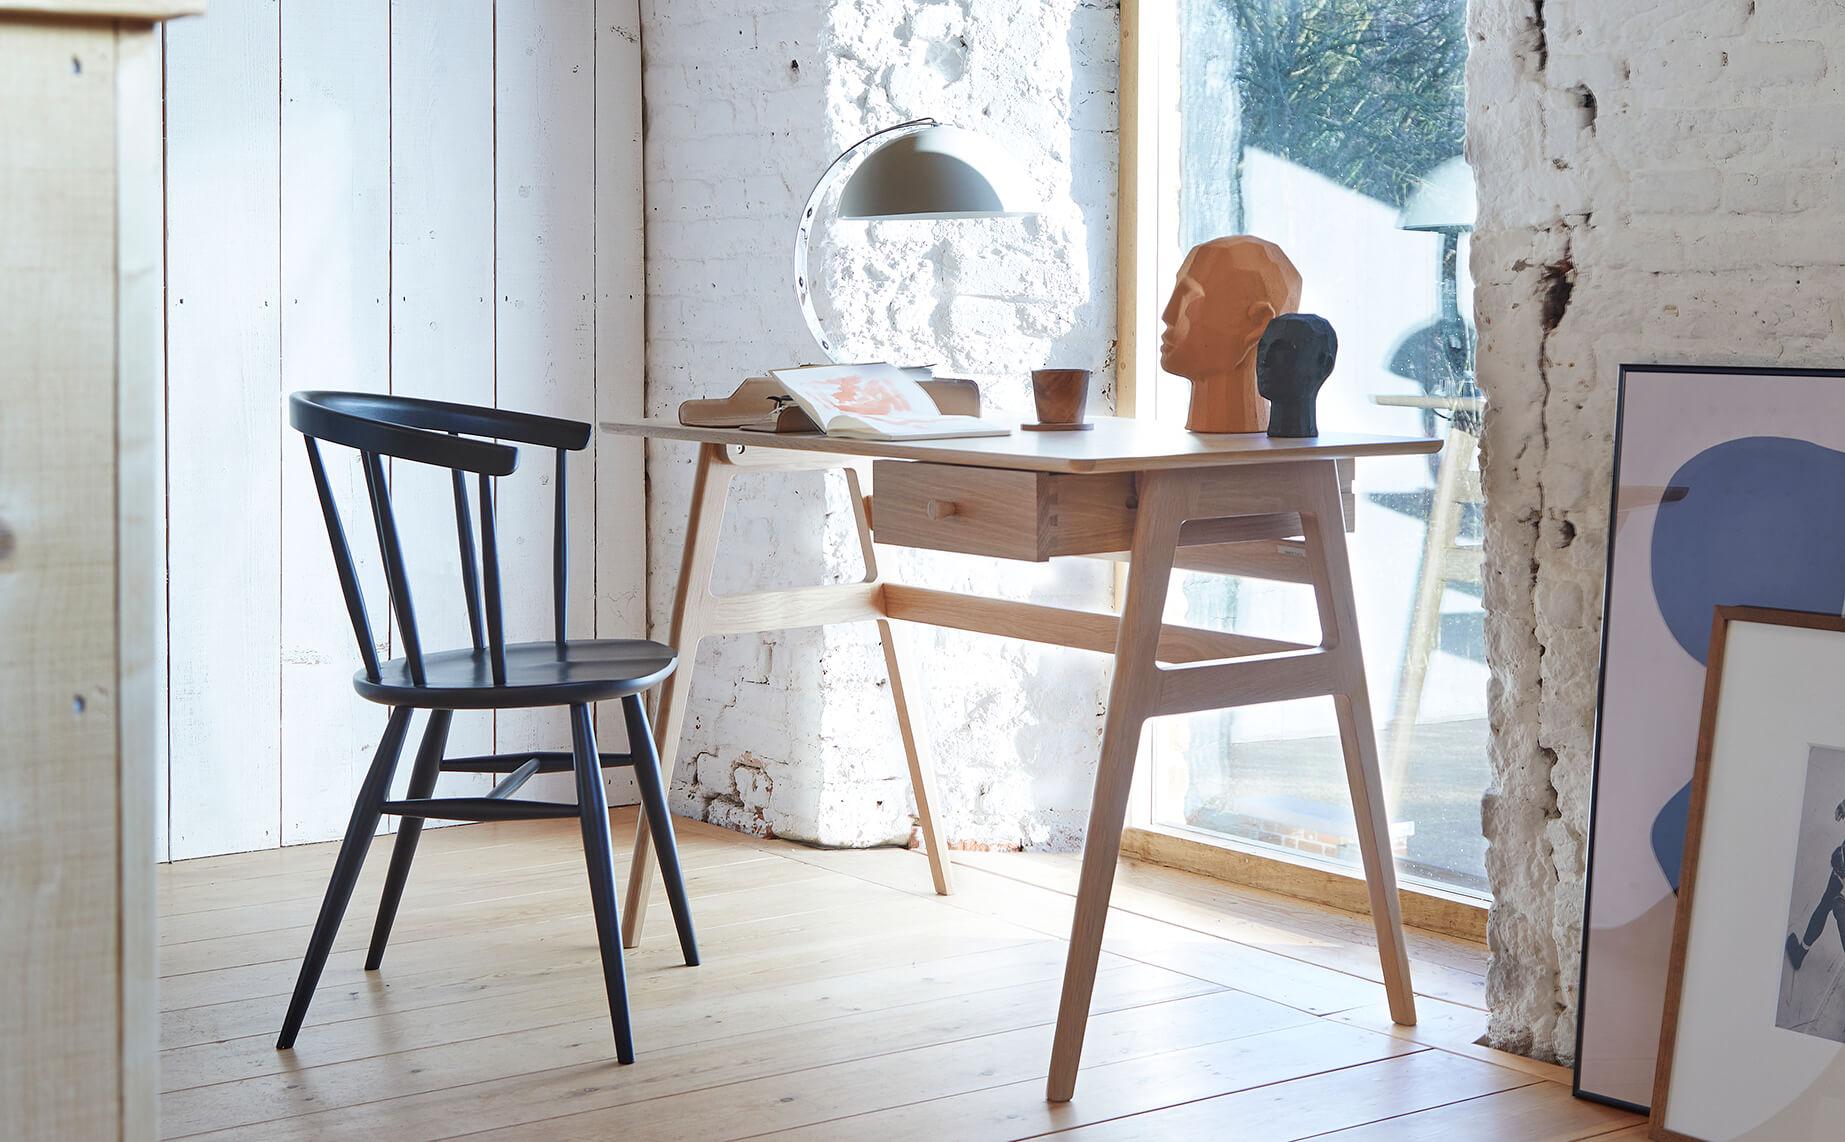 Ercol_Heritage-armchair-oak-BK-2202-Ballatta-desk-oak-cm.jpg